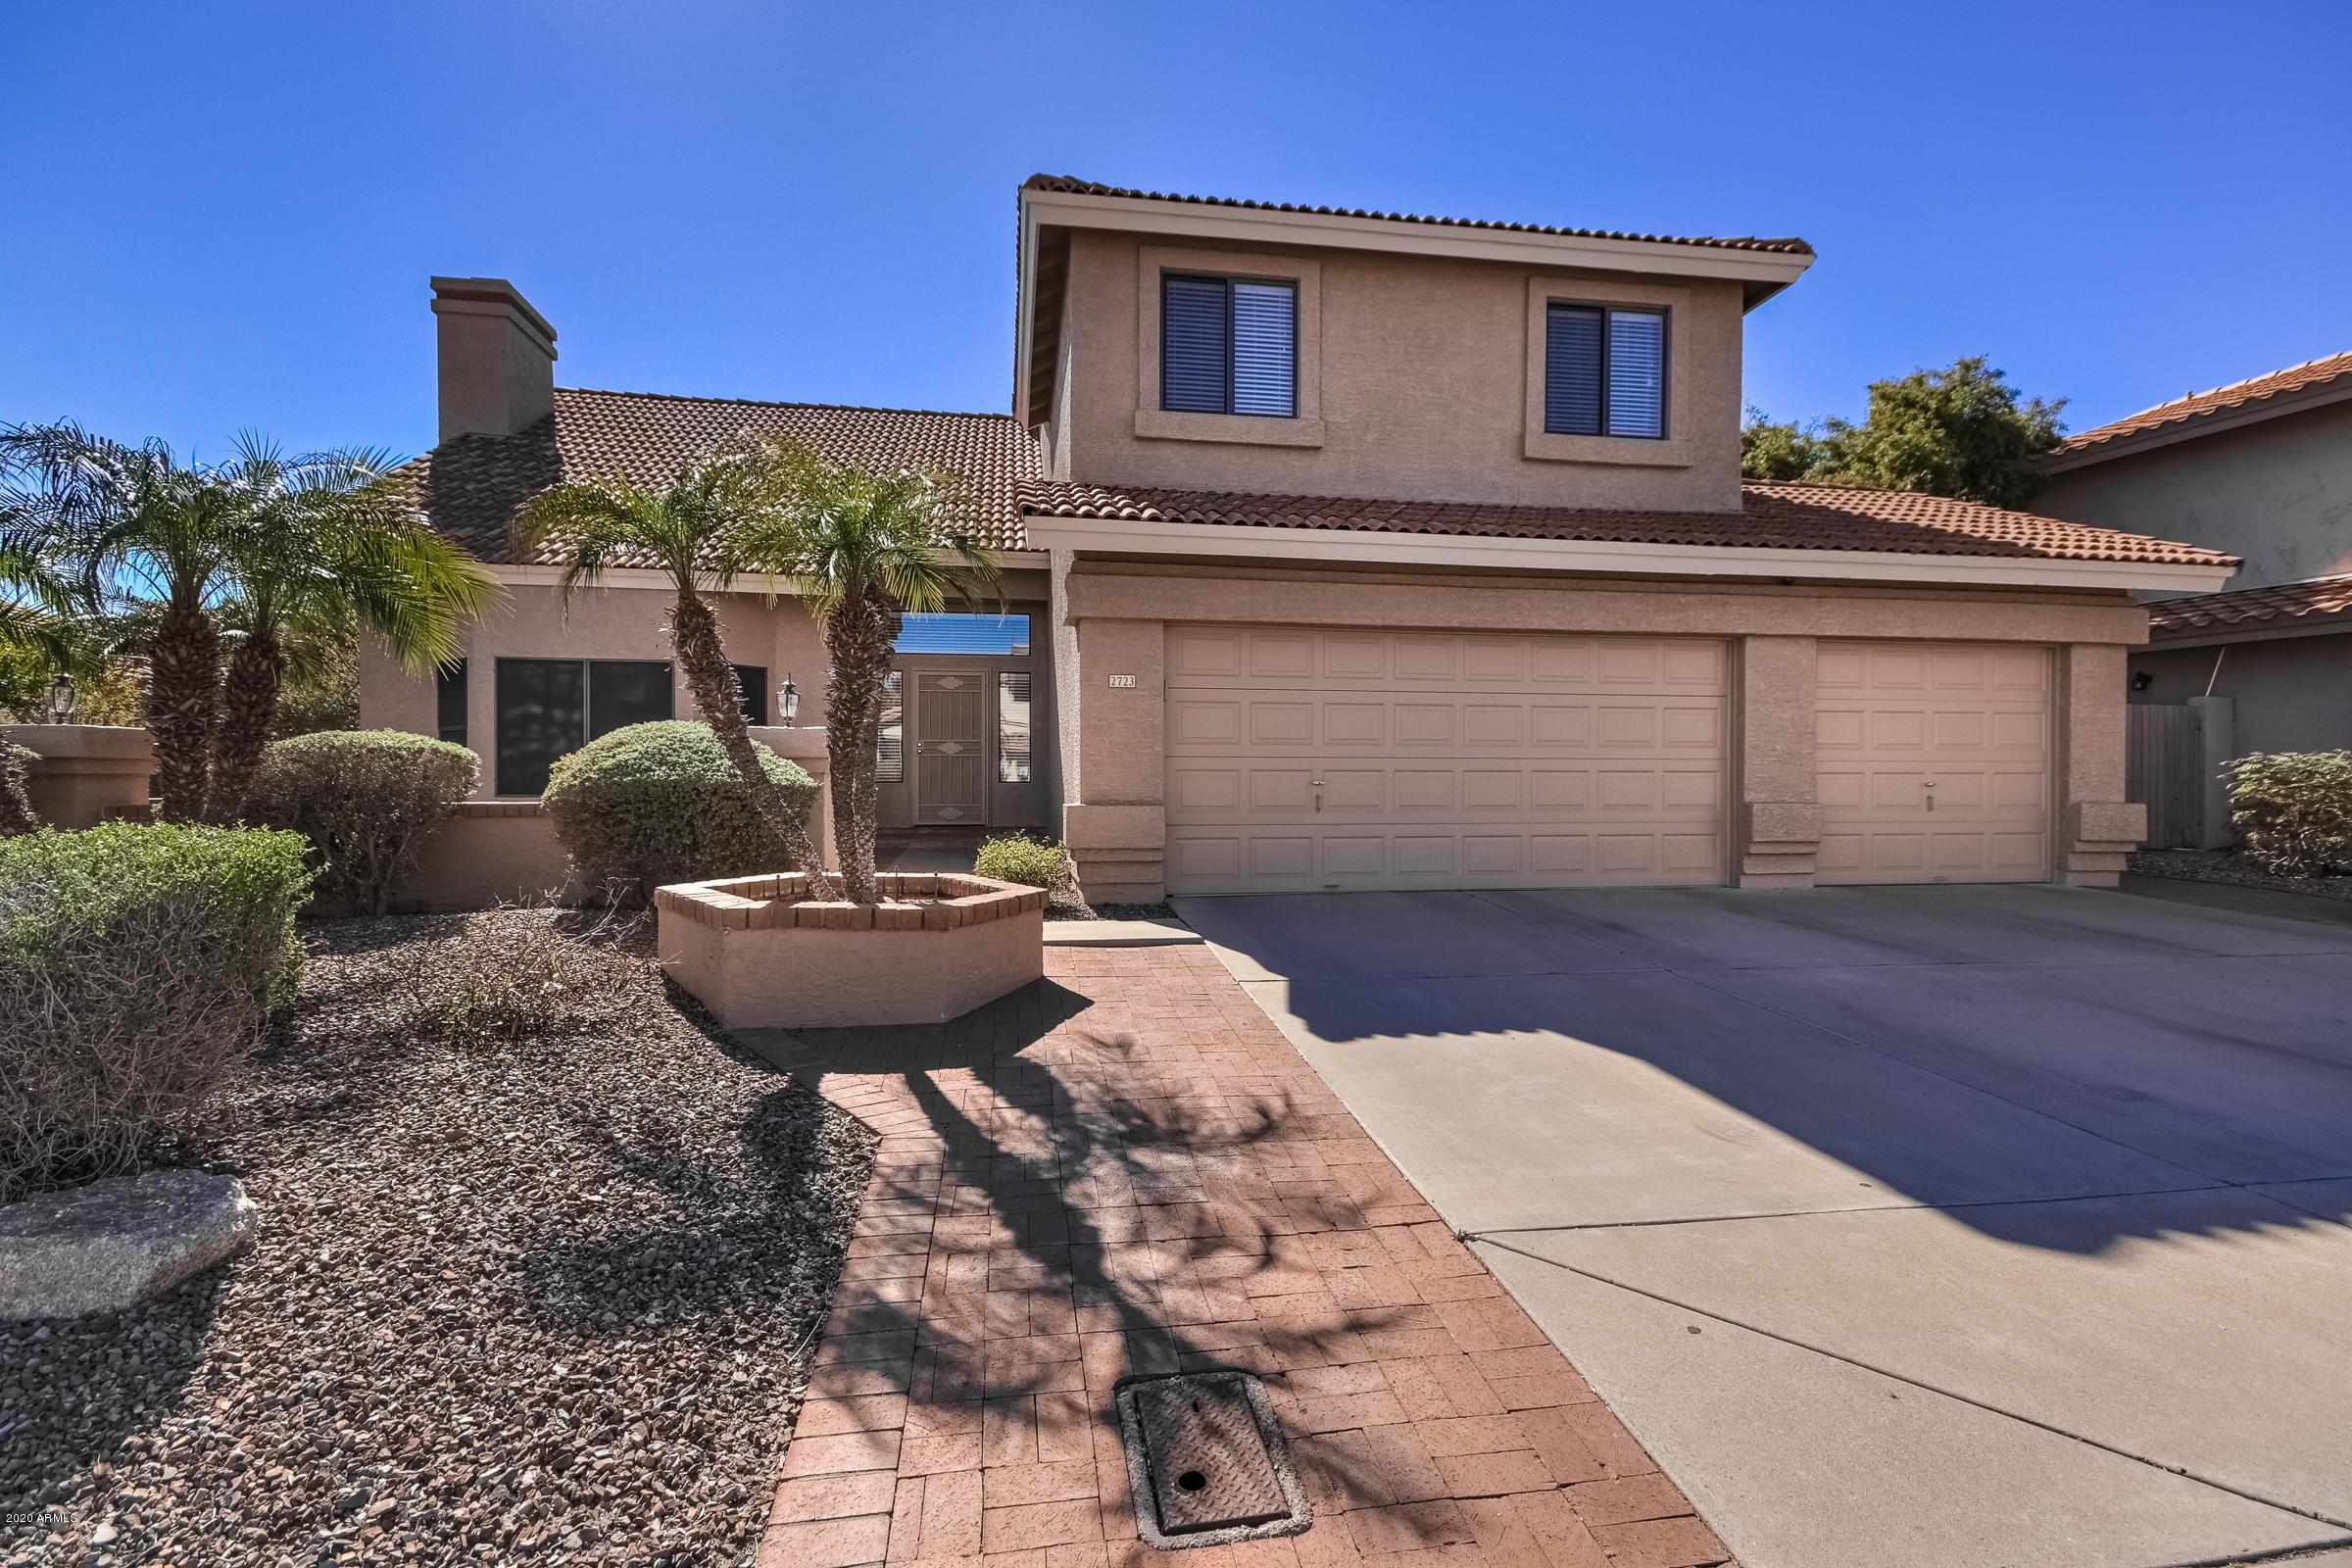 2723 E MOUNTAIN SKY Avenue, Phoenix, AZ 85048